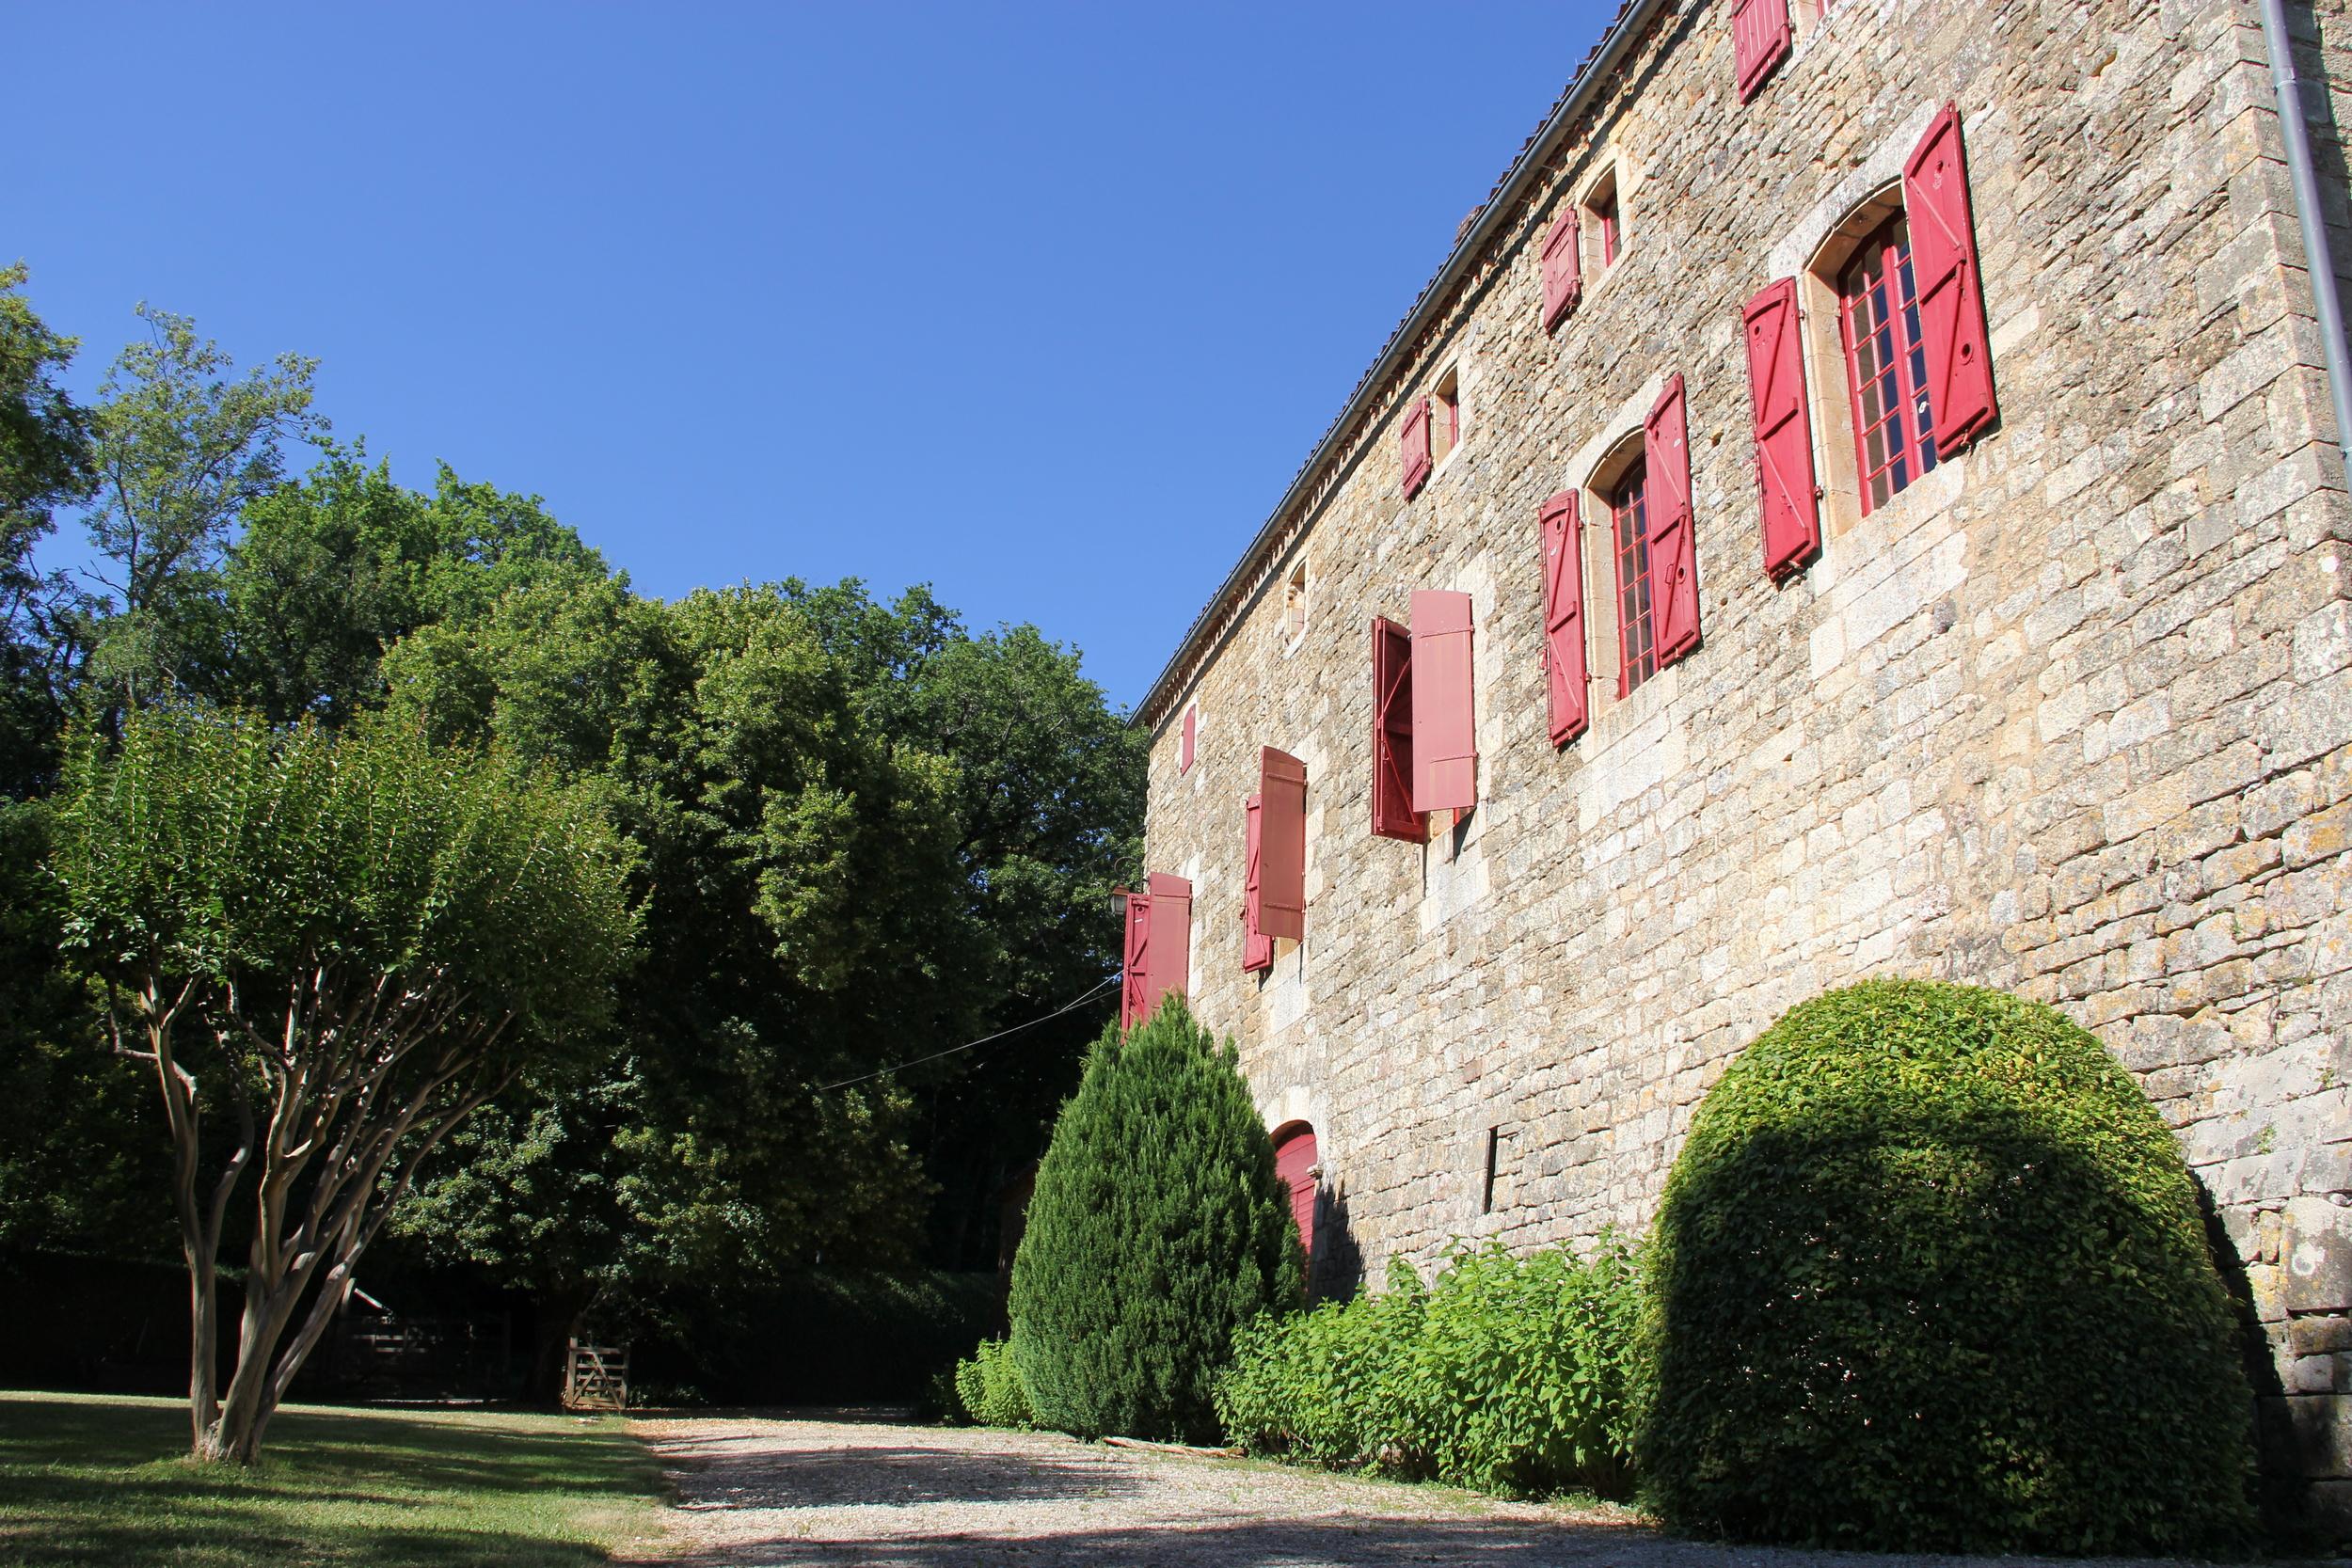 Charming 13th century chateau